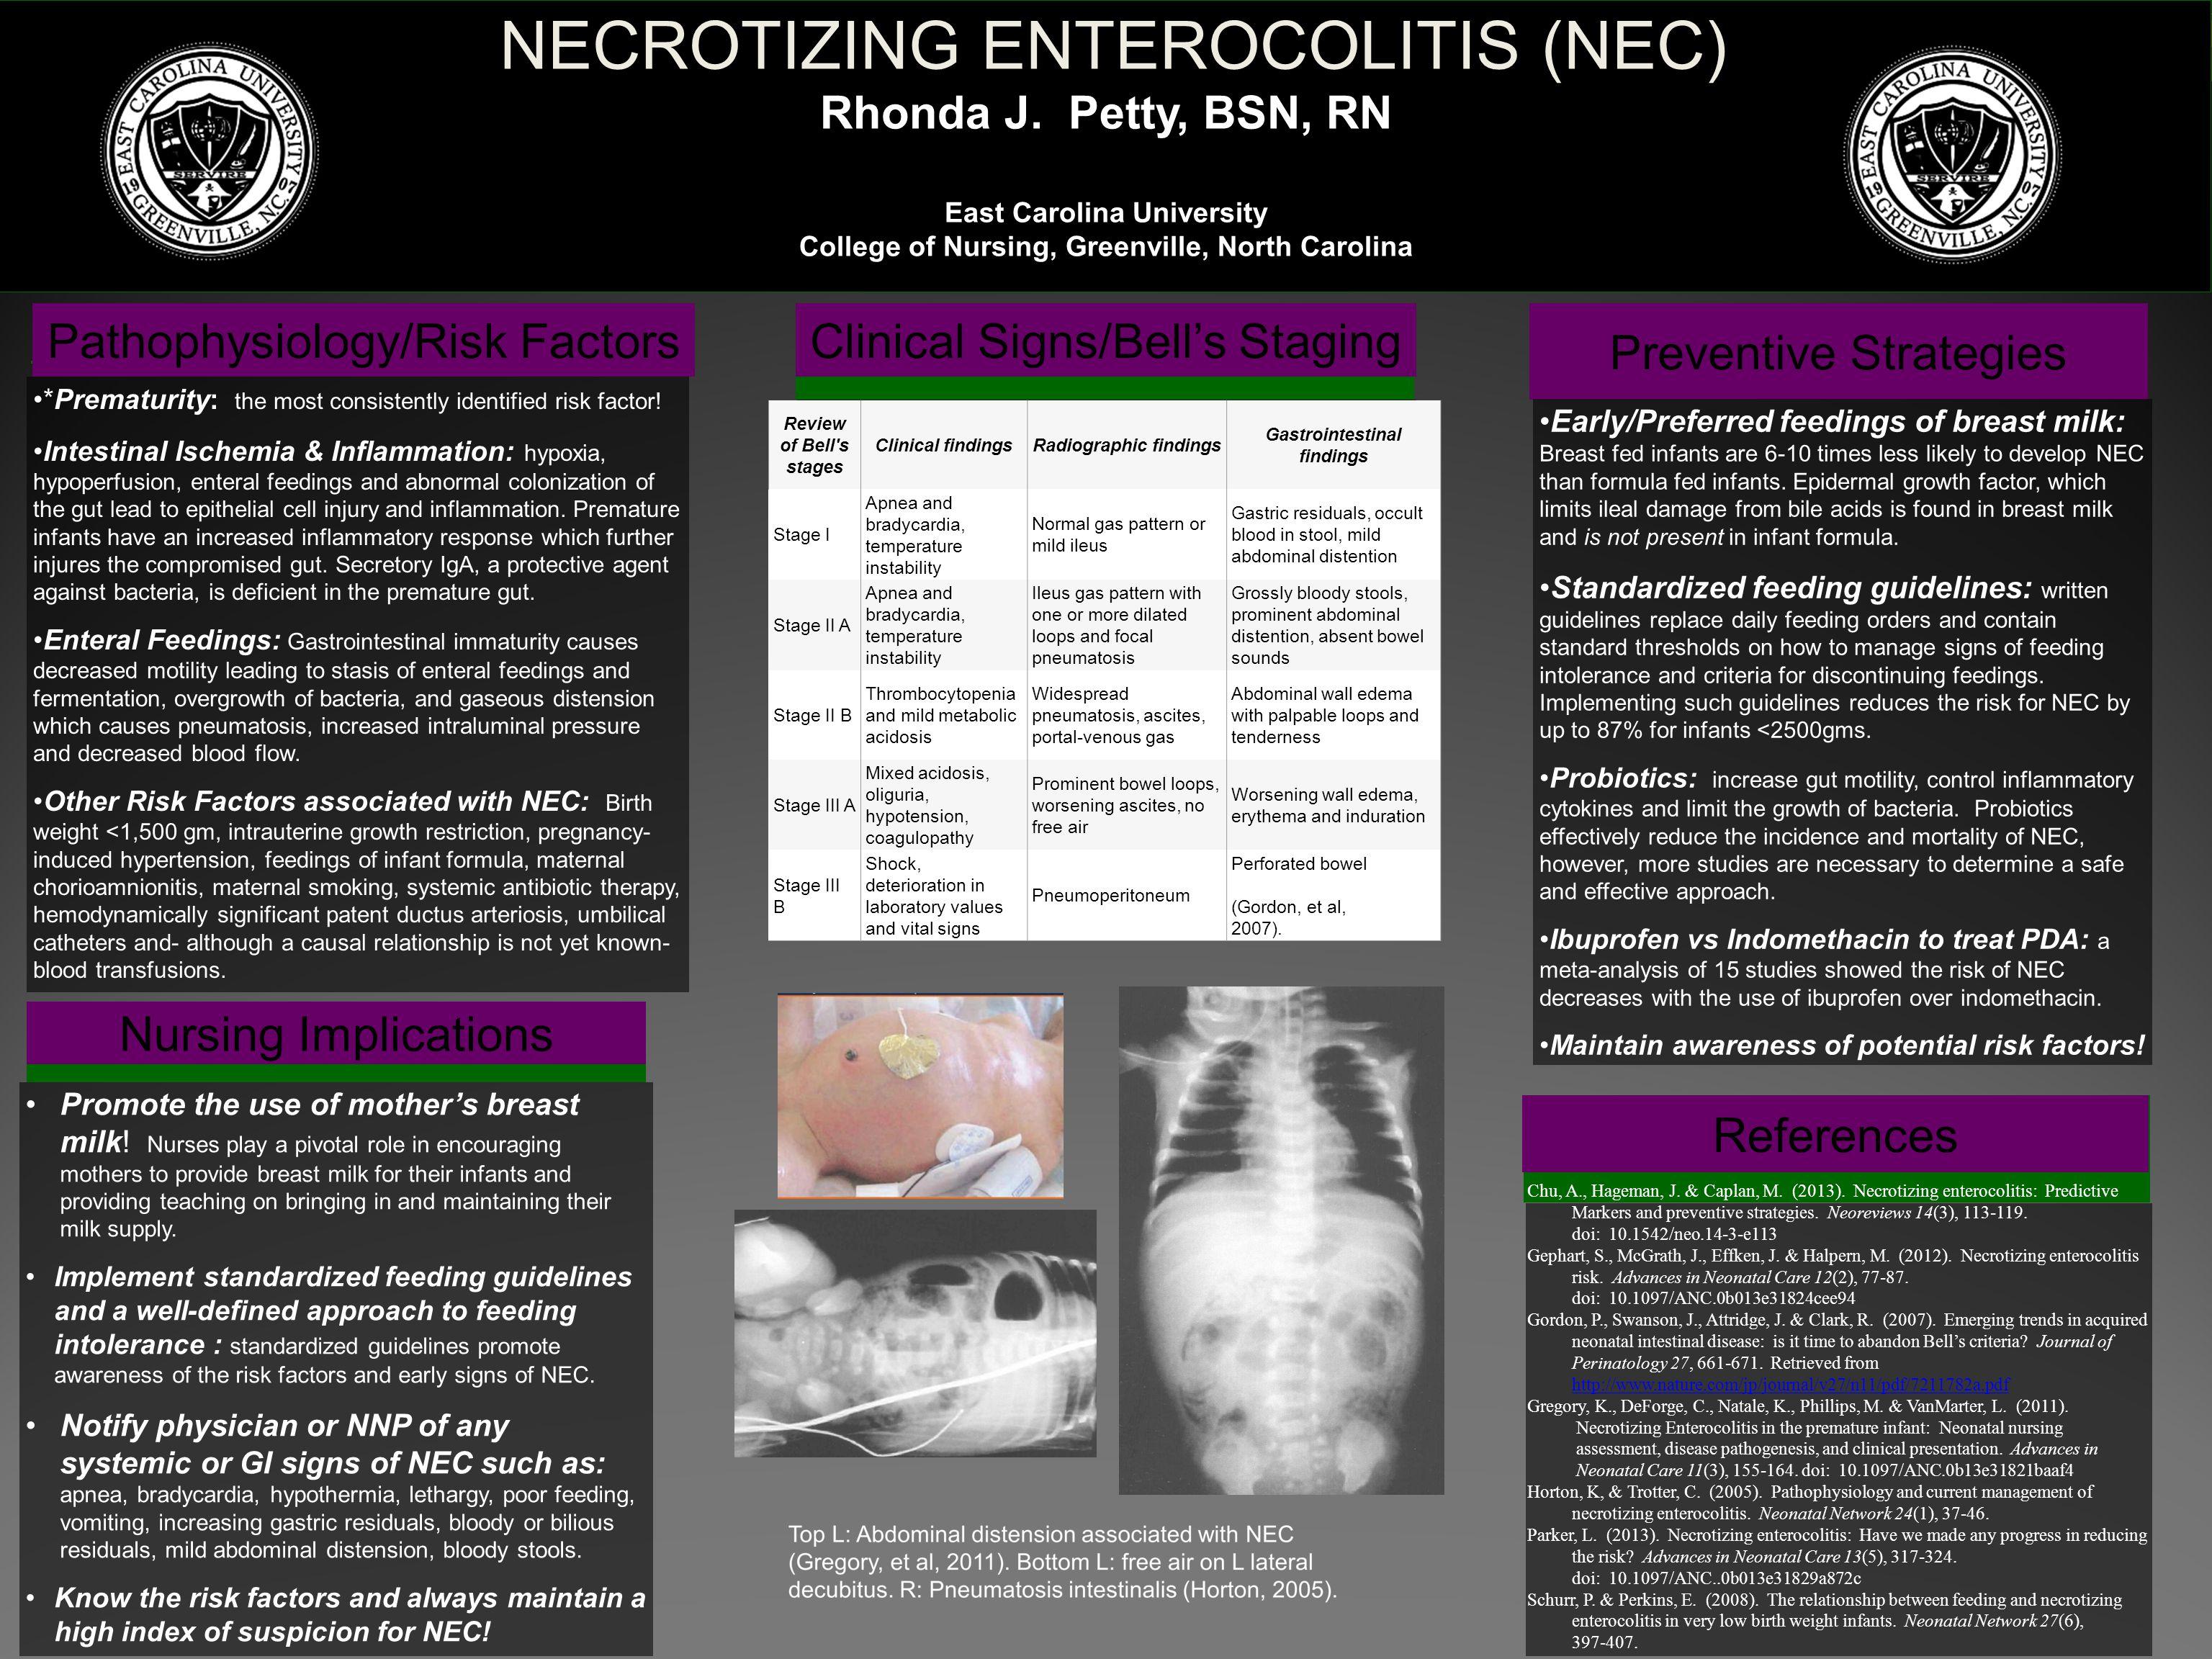 NECROTIZING ENTEROCOLITIS (NEC) Rhonda J. Petty, BSN, RN East Carolina University College of Nursing, Greenville, North Carolina Pathophysiology/Risk